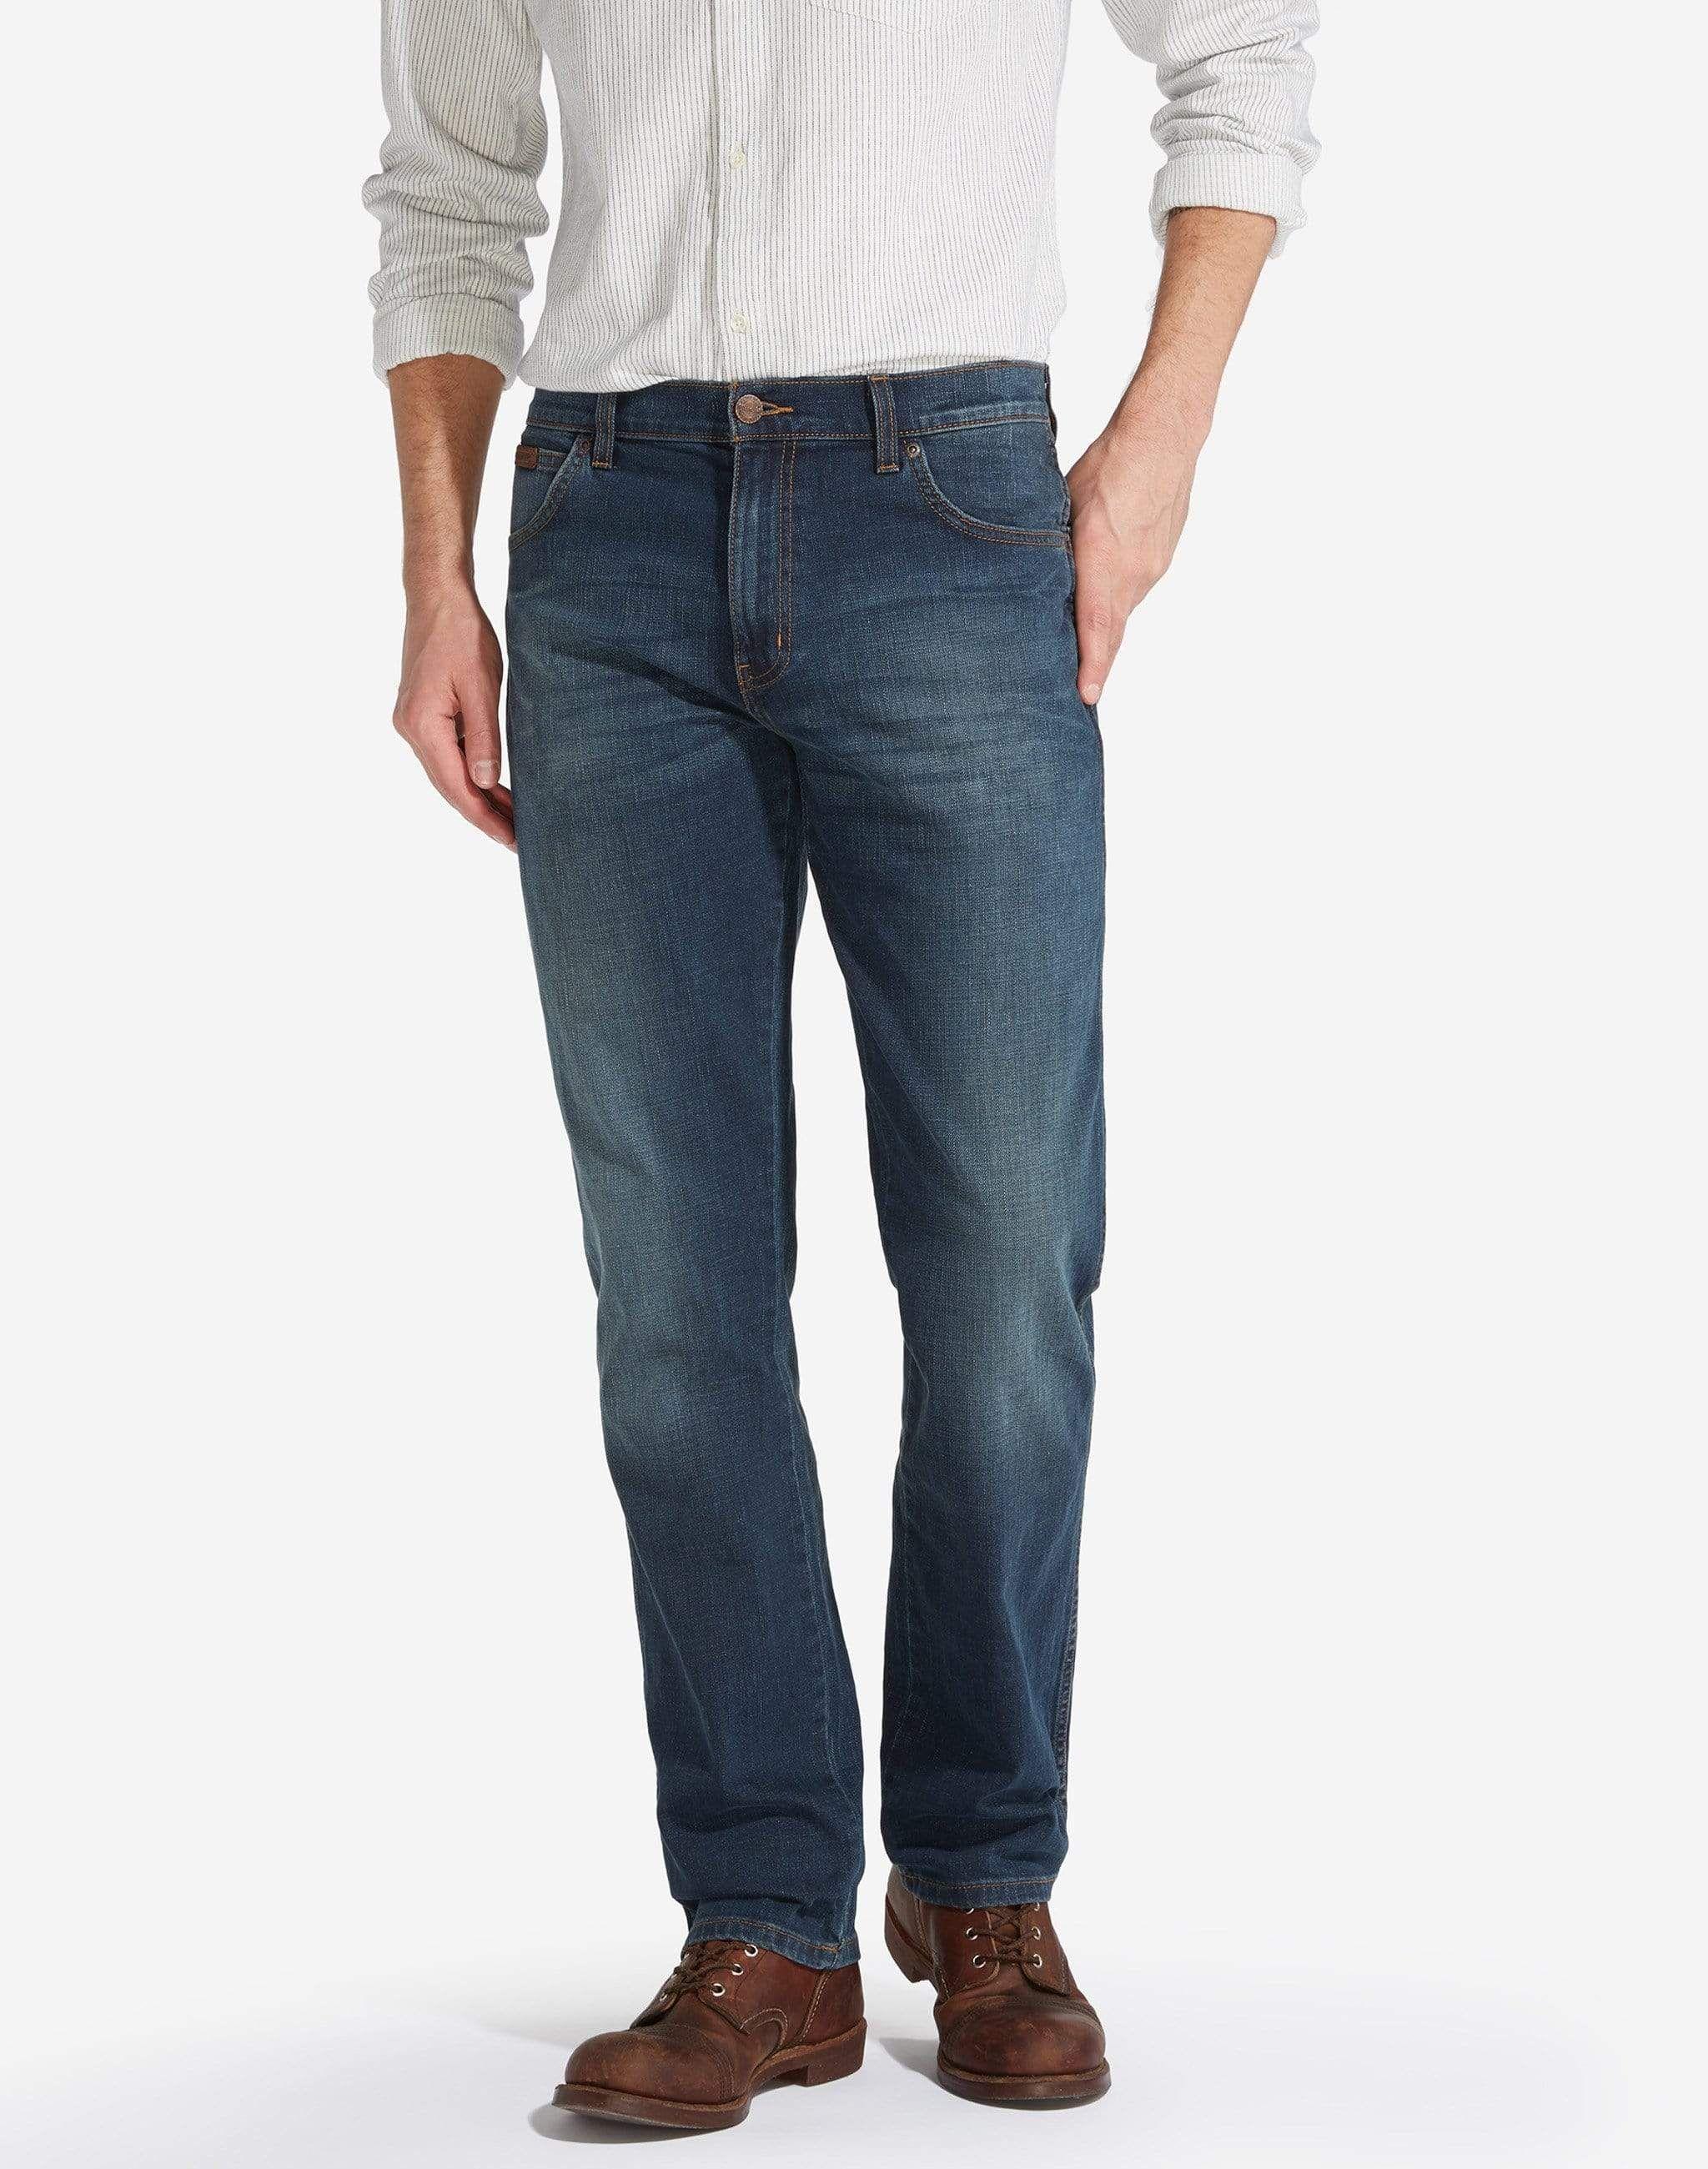 Classic Wrangler Regular Fit Texas Stretch Vintage Denim Jeans Pants  For Men